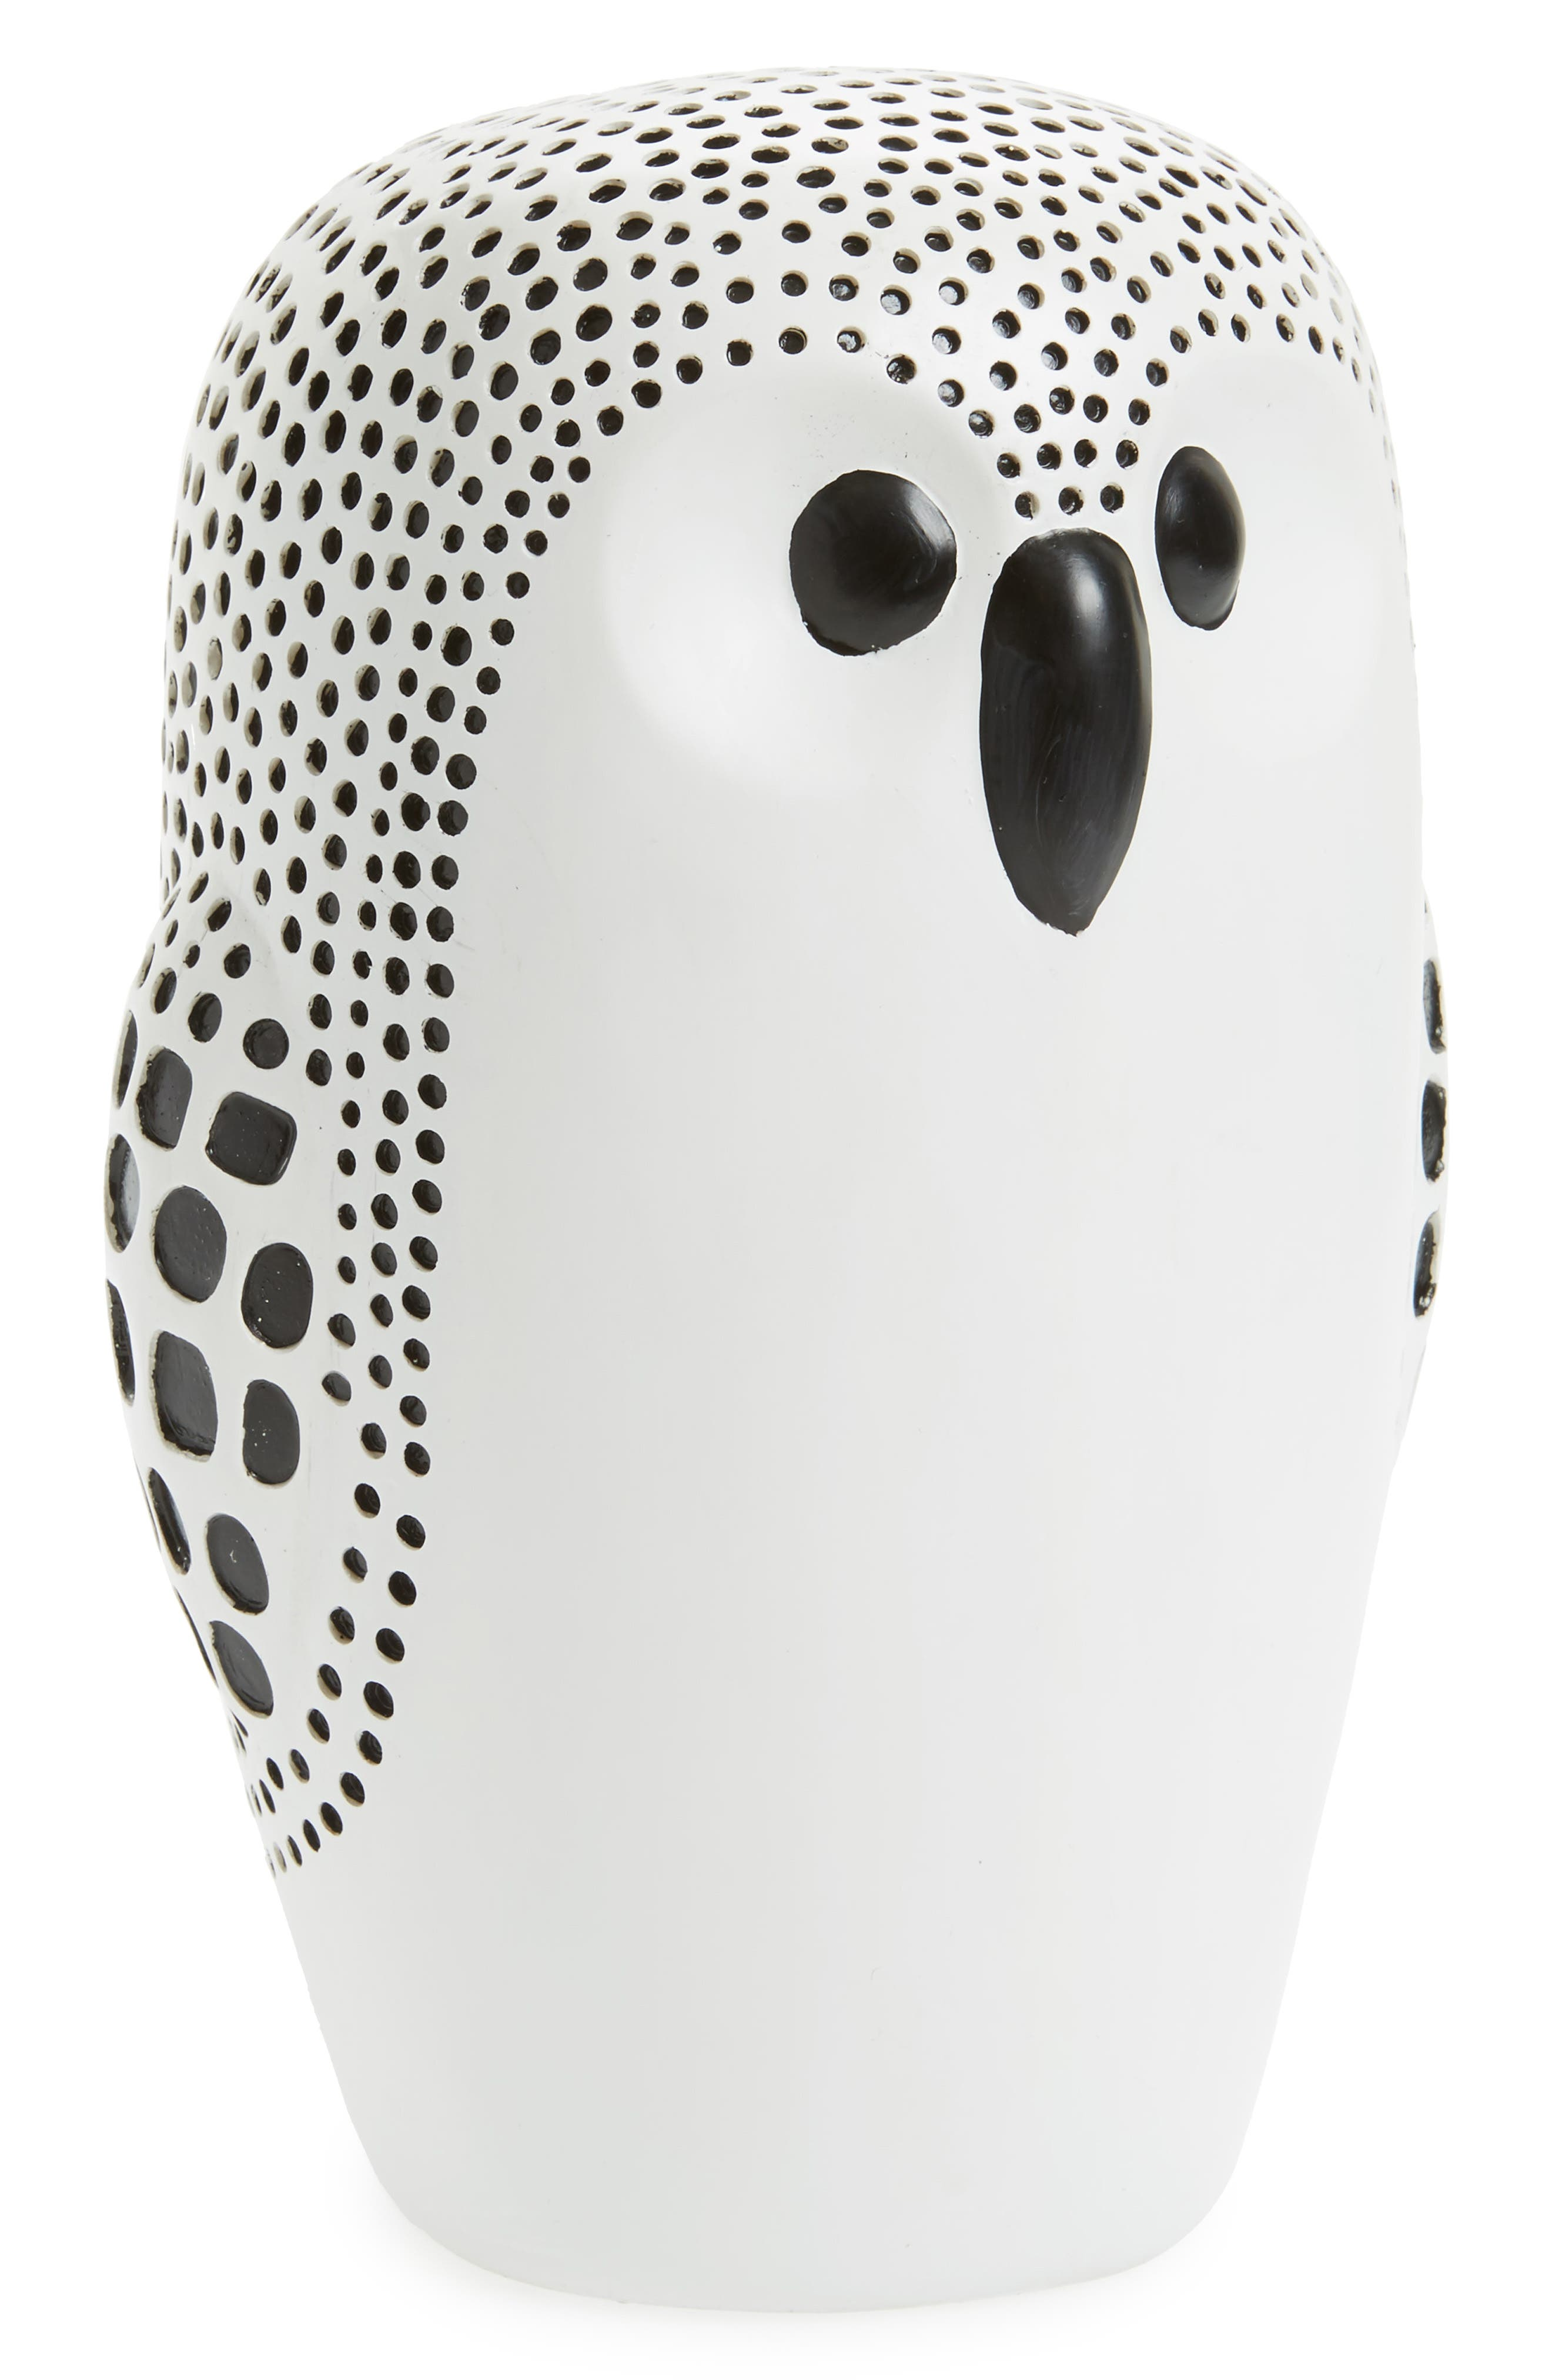 Home Owl Decoration,                         Main,                         color, Black-White